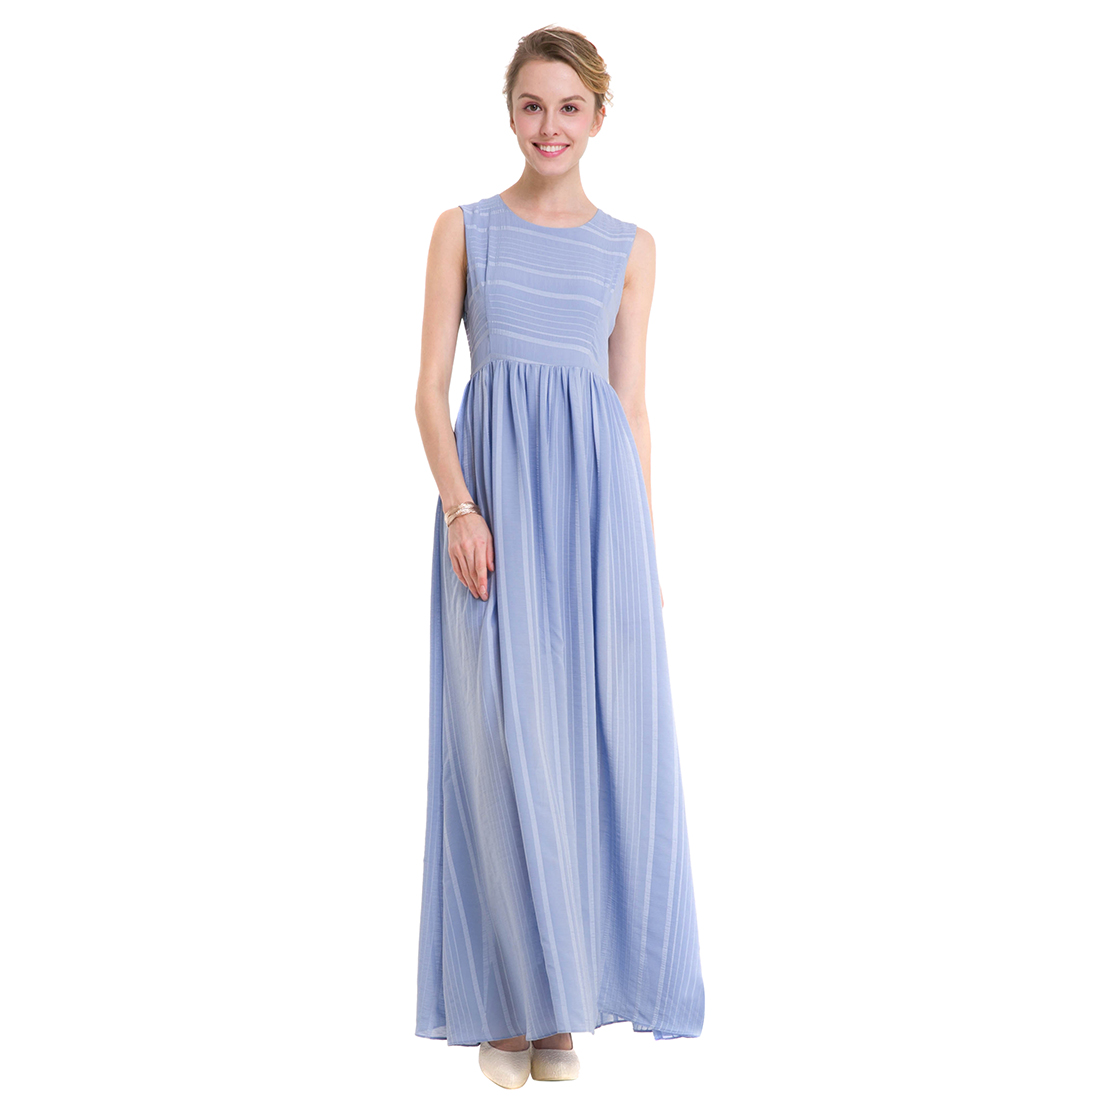 TFGS Original Design Summer Women High End Chiffon Dresses Summer Ladies Temperament Loose Big Stripe Dress